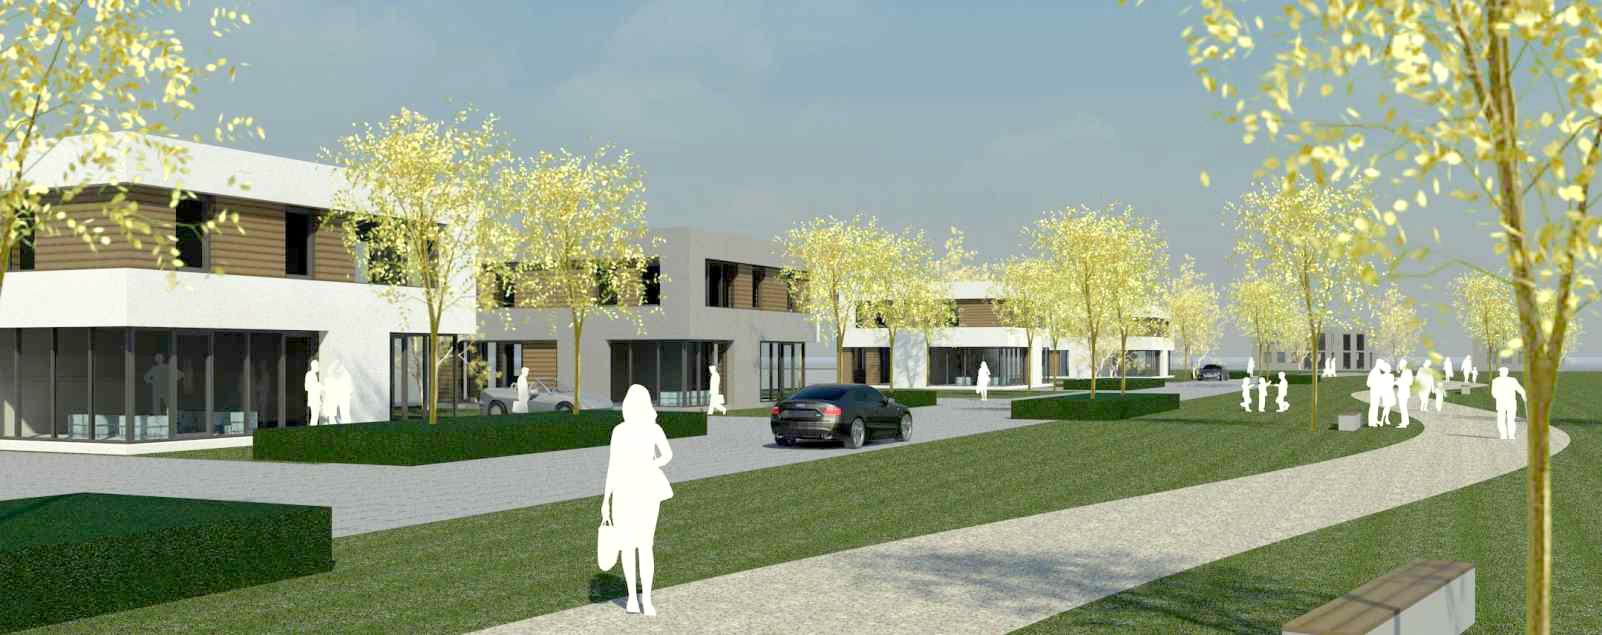 Wohnbebauung Lechtenweg<strong>Lippstadt | Entwurf 2013</strong>